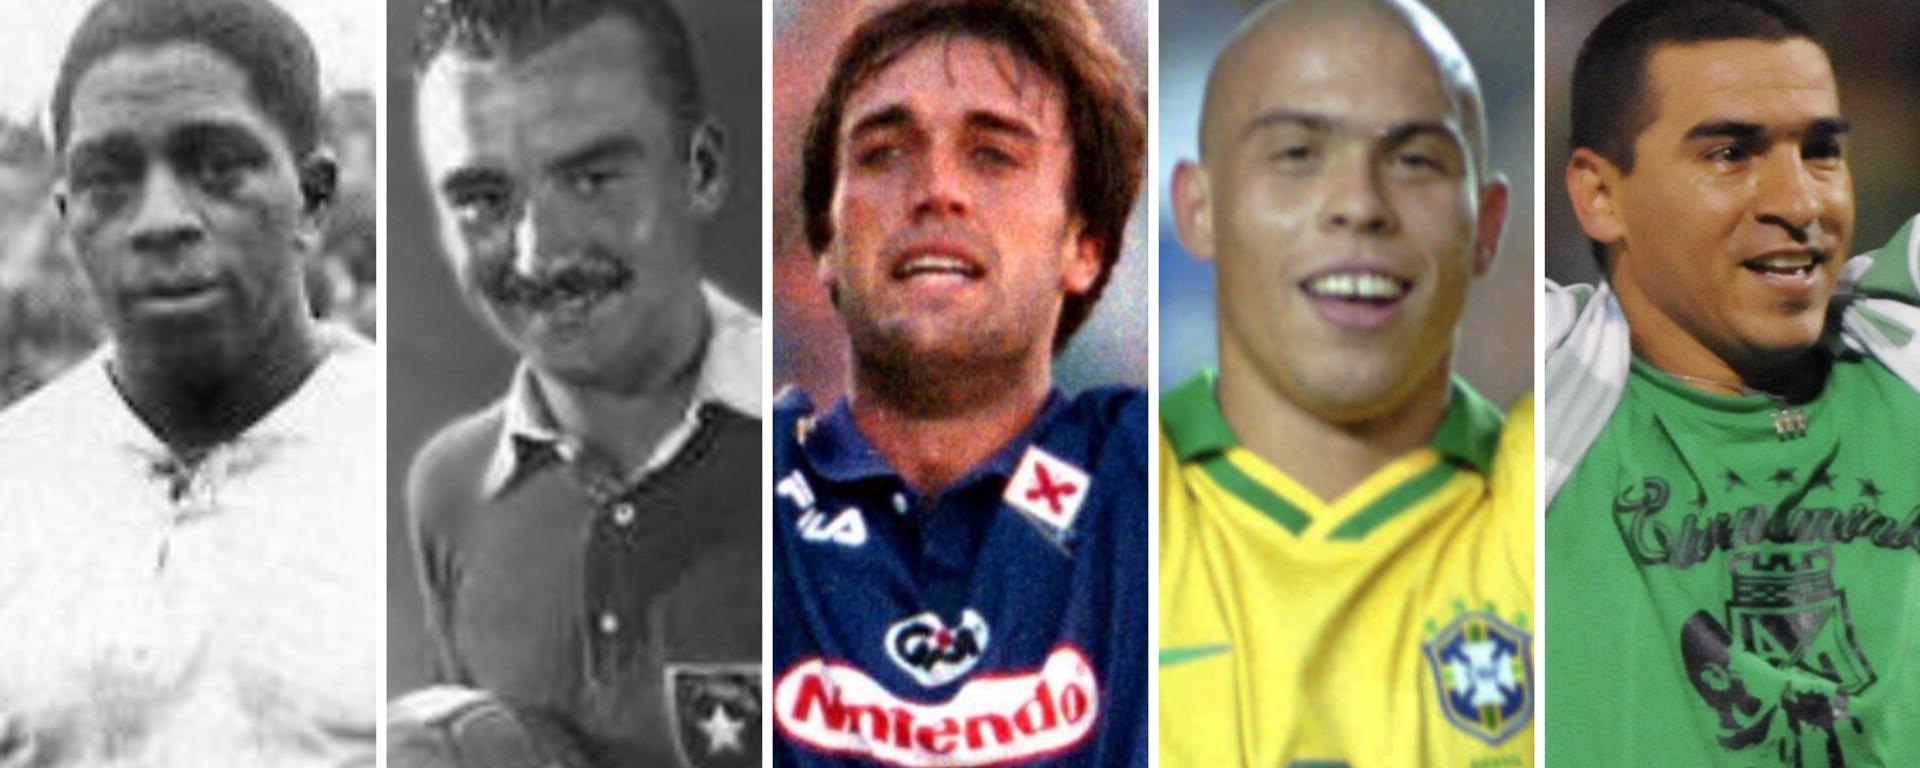 Los futbolistas Isabelino Gradín, Sergio Livingstone, Gabriel Batistuta, Ronaldo y Víctor Aristizábal - Sputnik Mundo, 1920, 03.07.2021